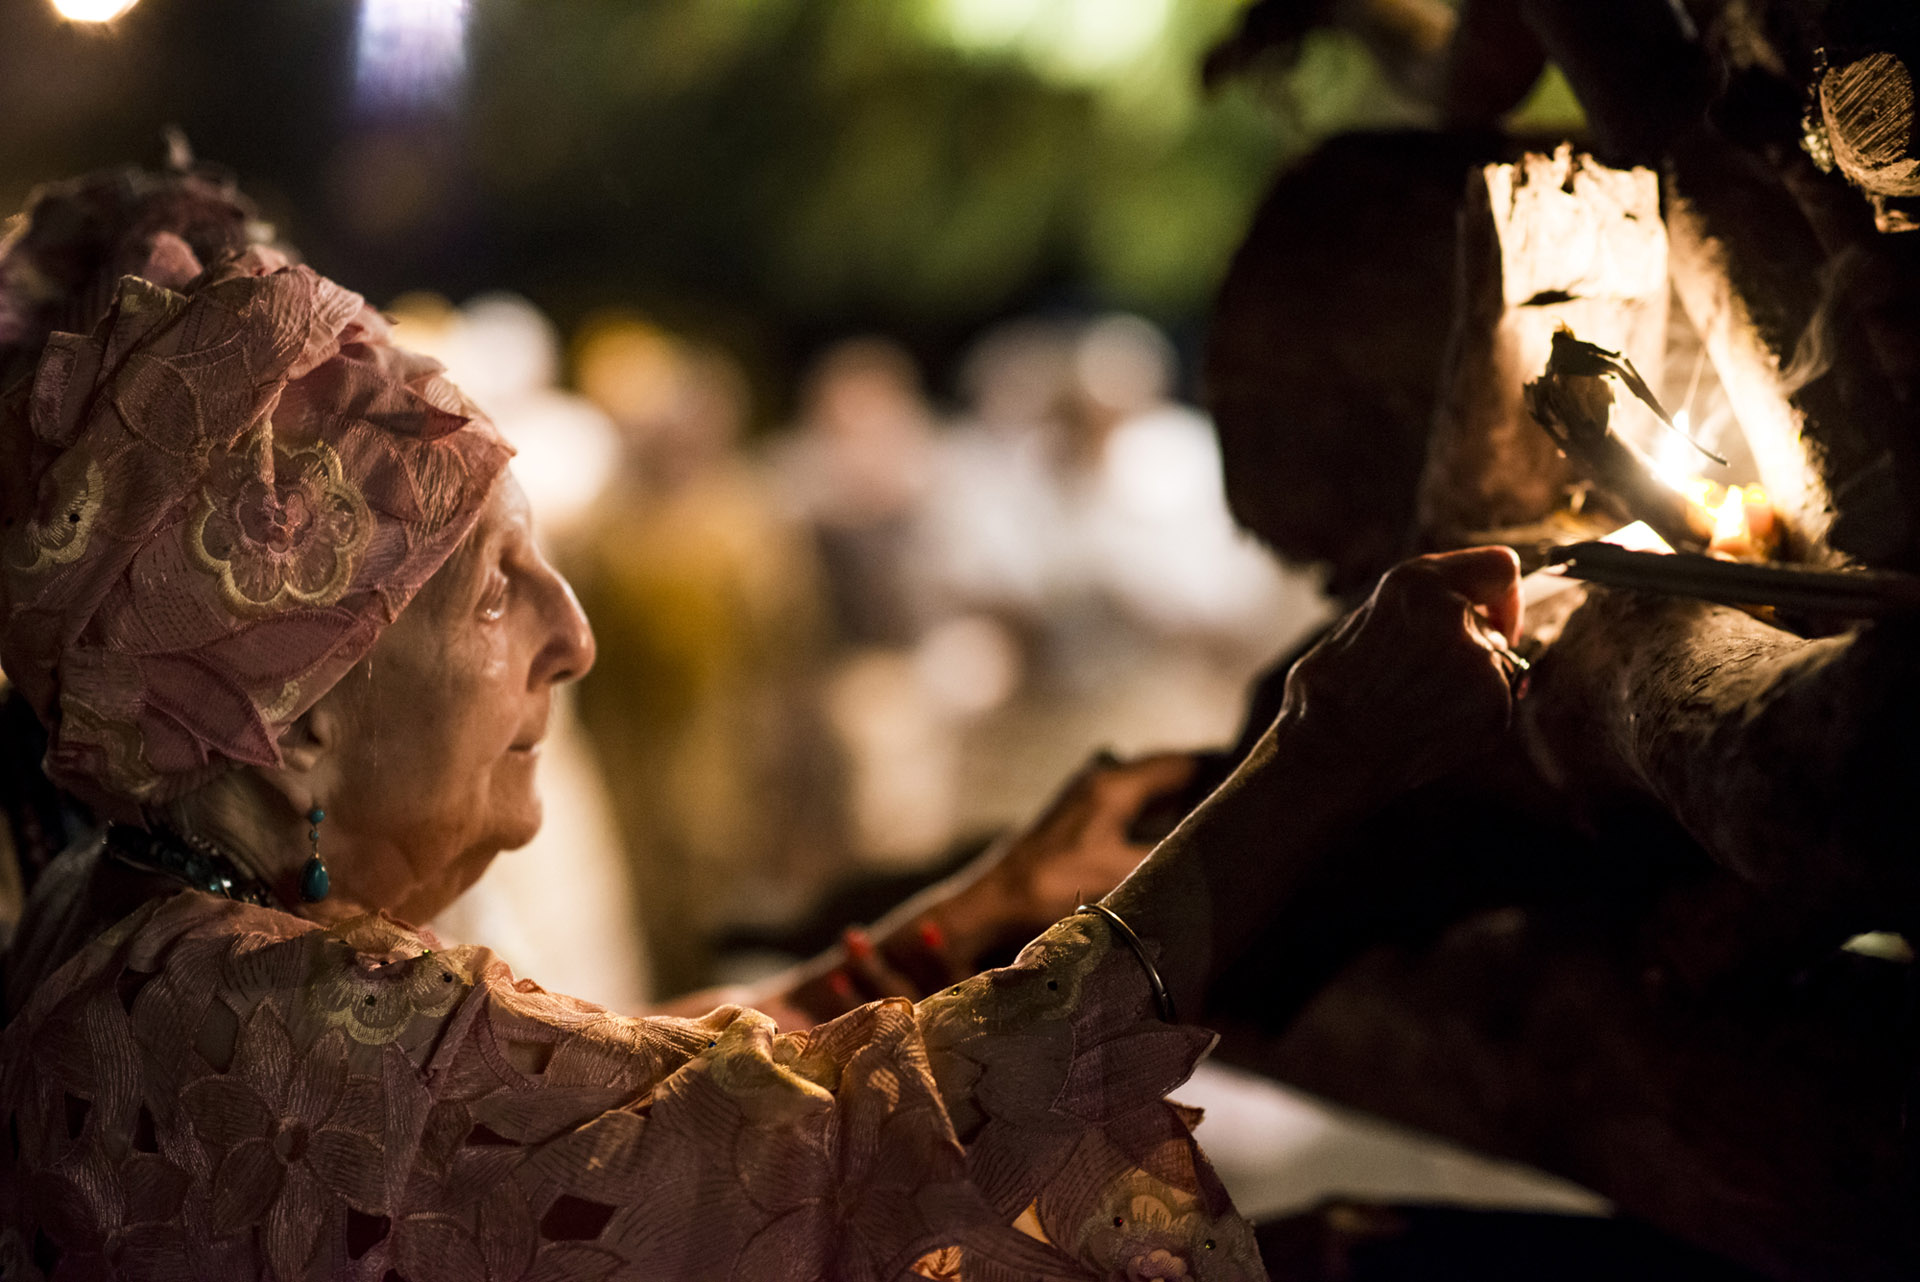 Festa de Santo.Fogueira de Xangô. YA GISELLE.29.06.2014.